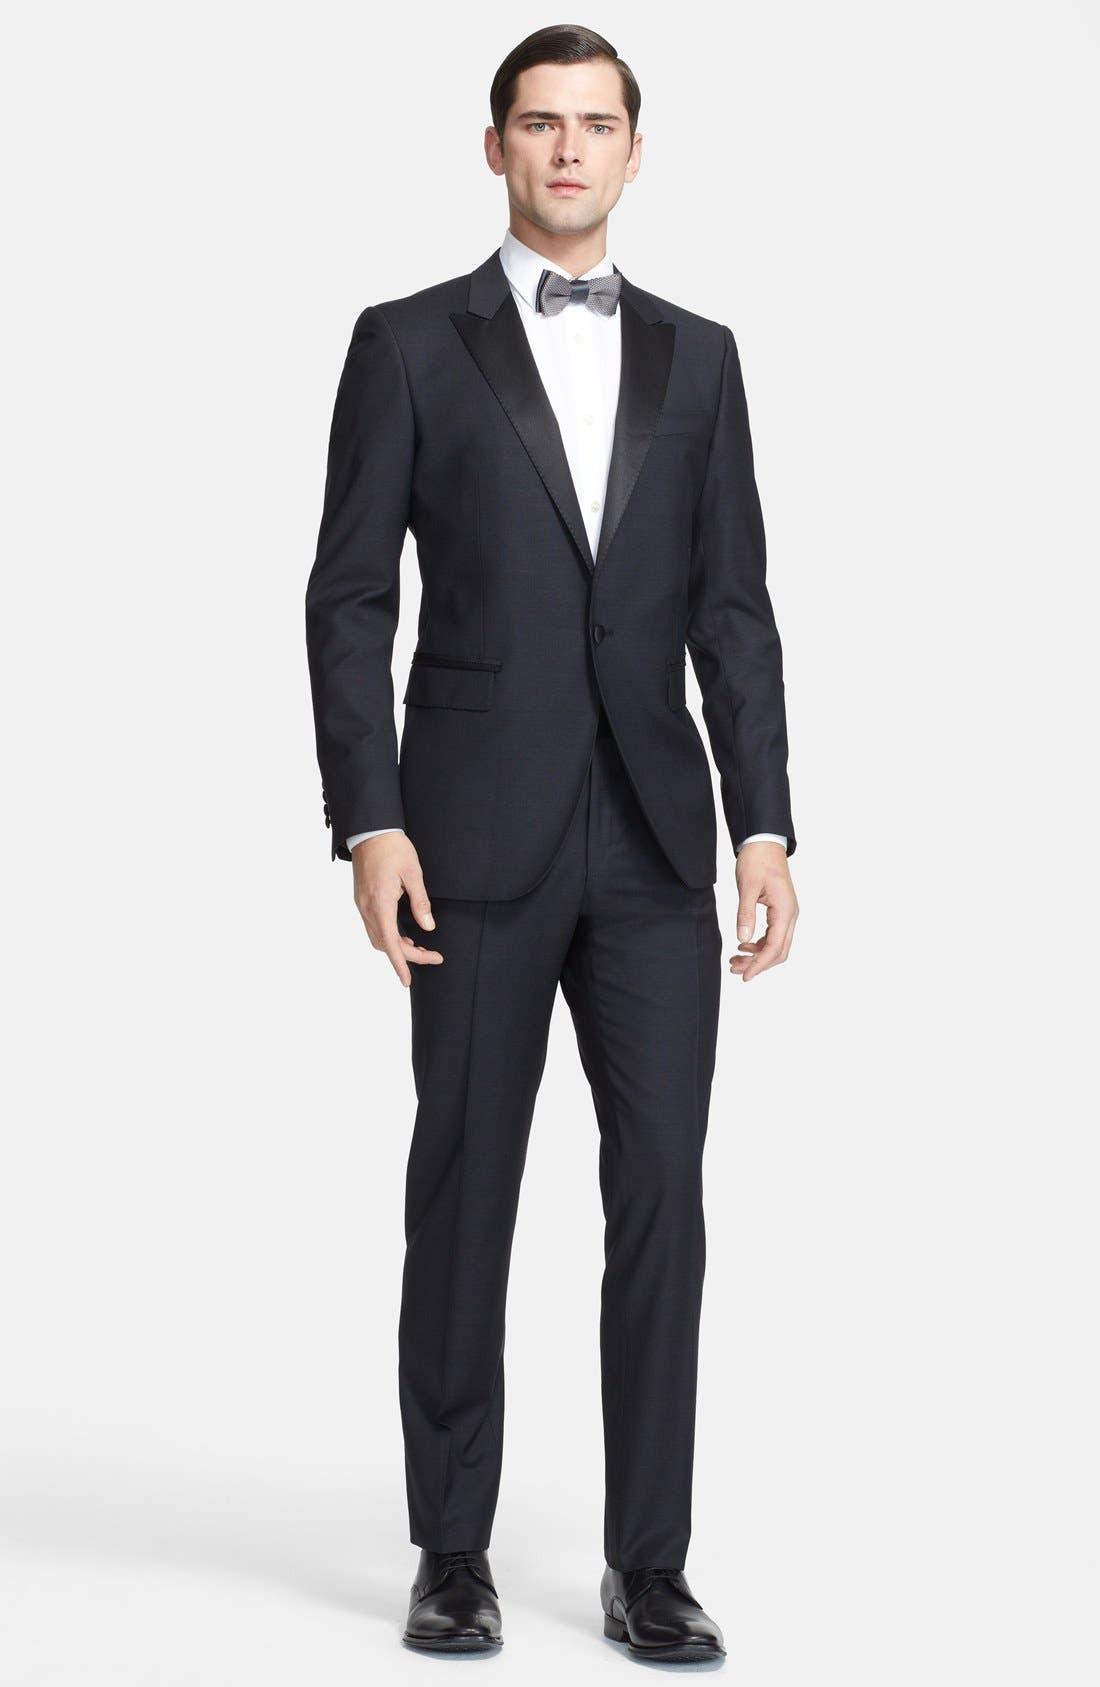 Main Image - Lanvin 'Attitude' Black Wool Tuxedo